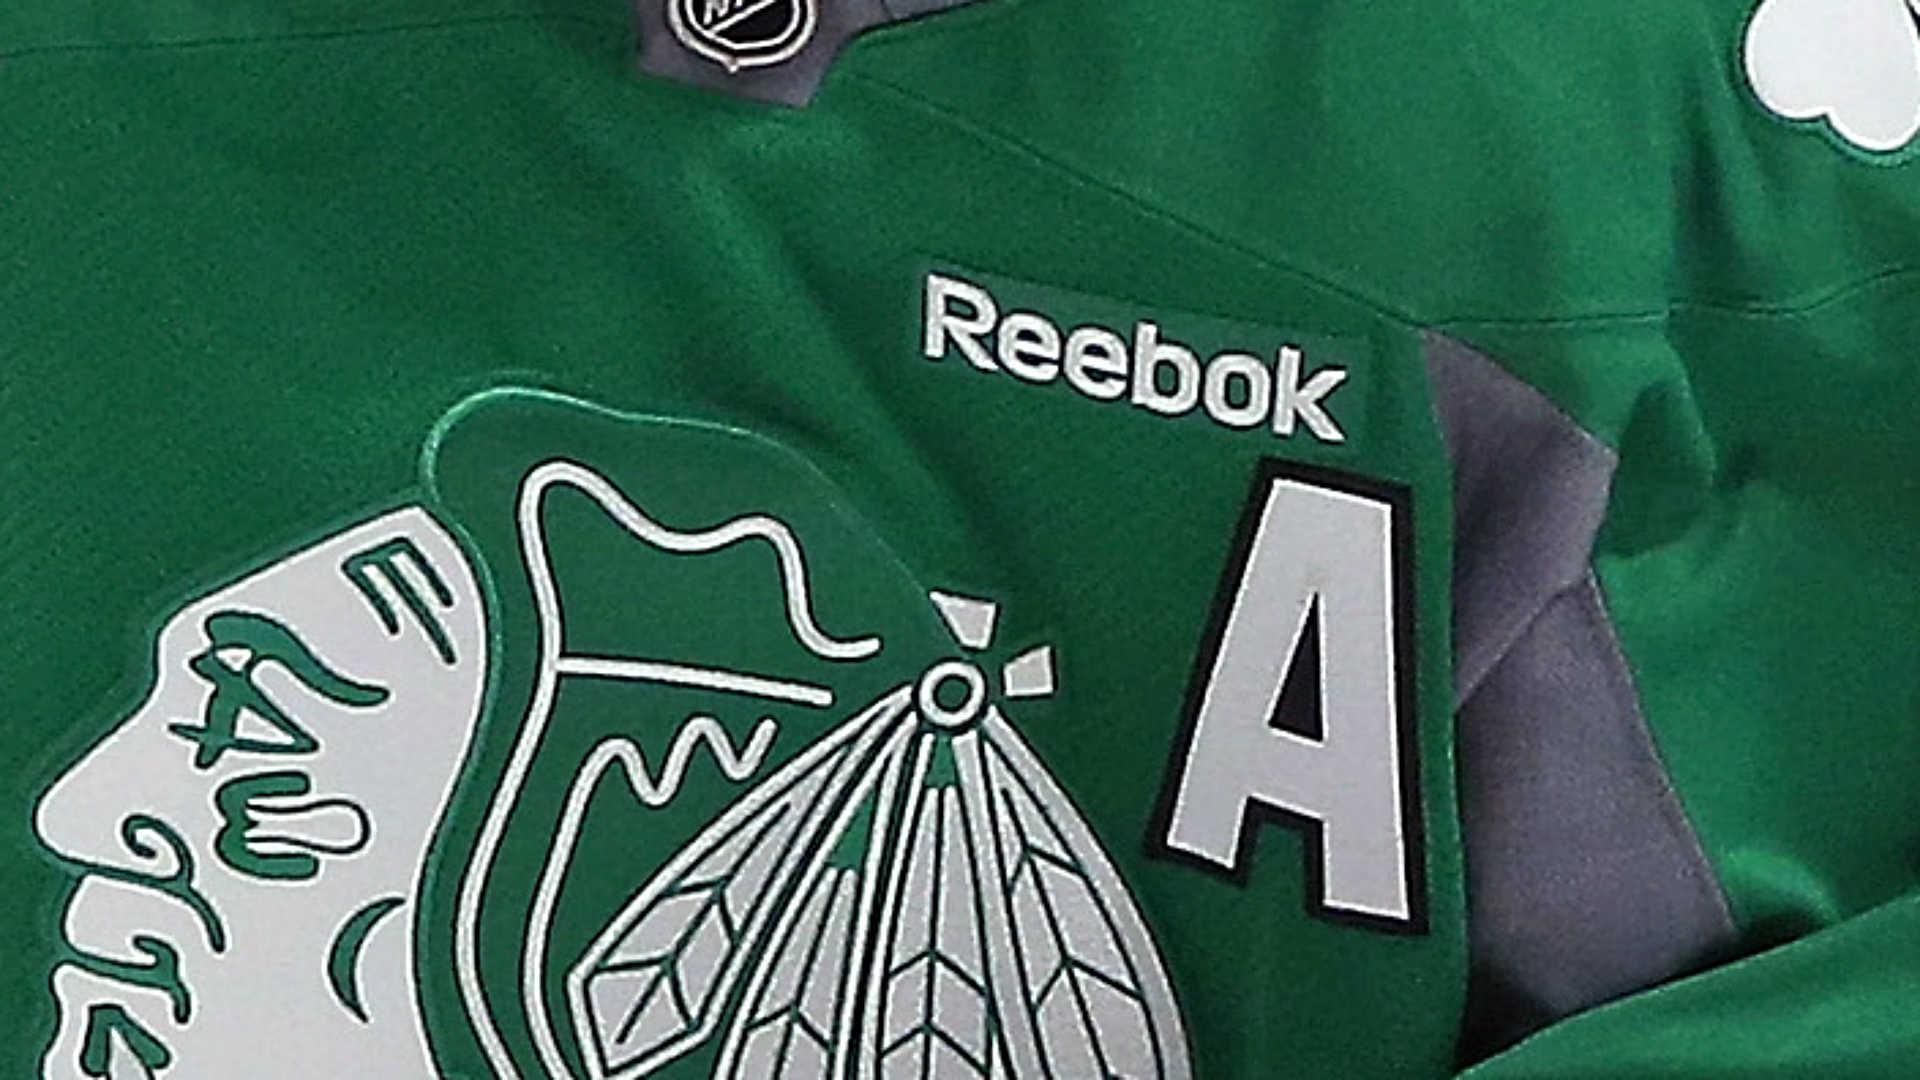 Blackhawks-uni-091814-Getty-FTR.jpg